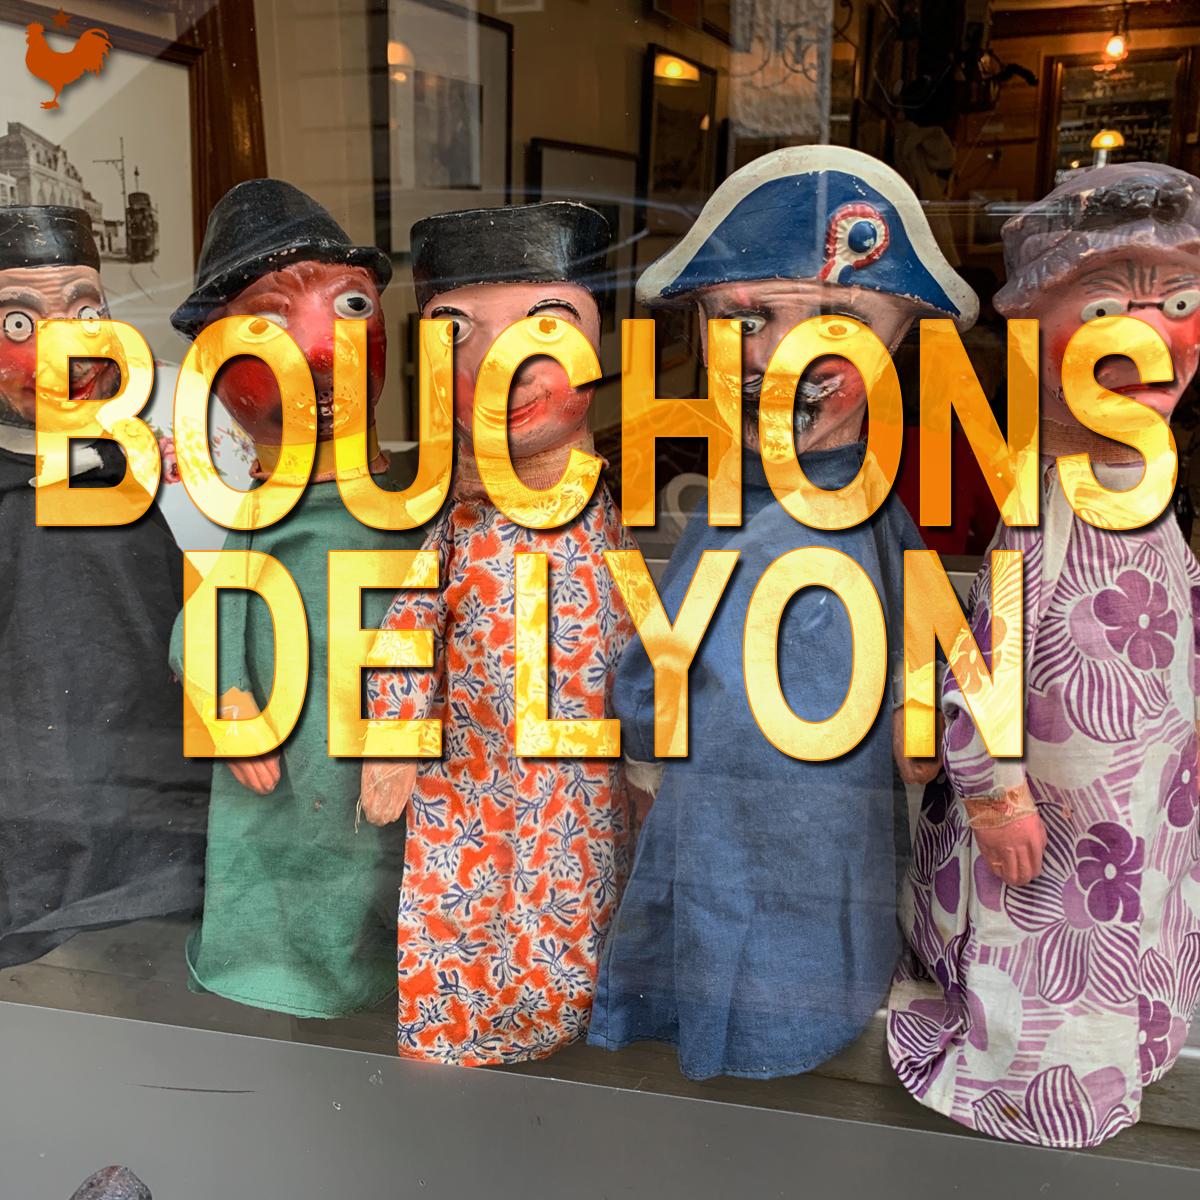 Les véritables bouchons de Lyon (recommandés par les grands chefs)